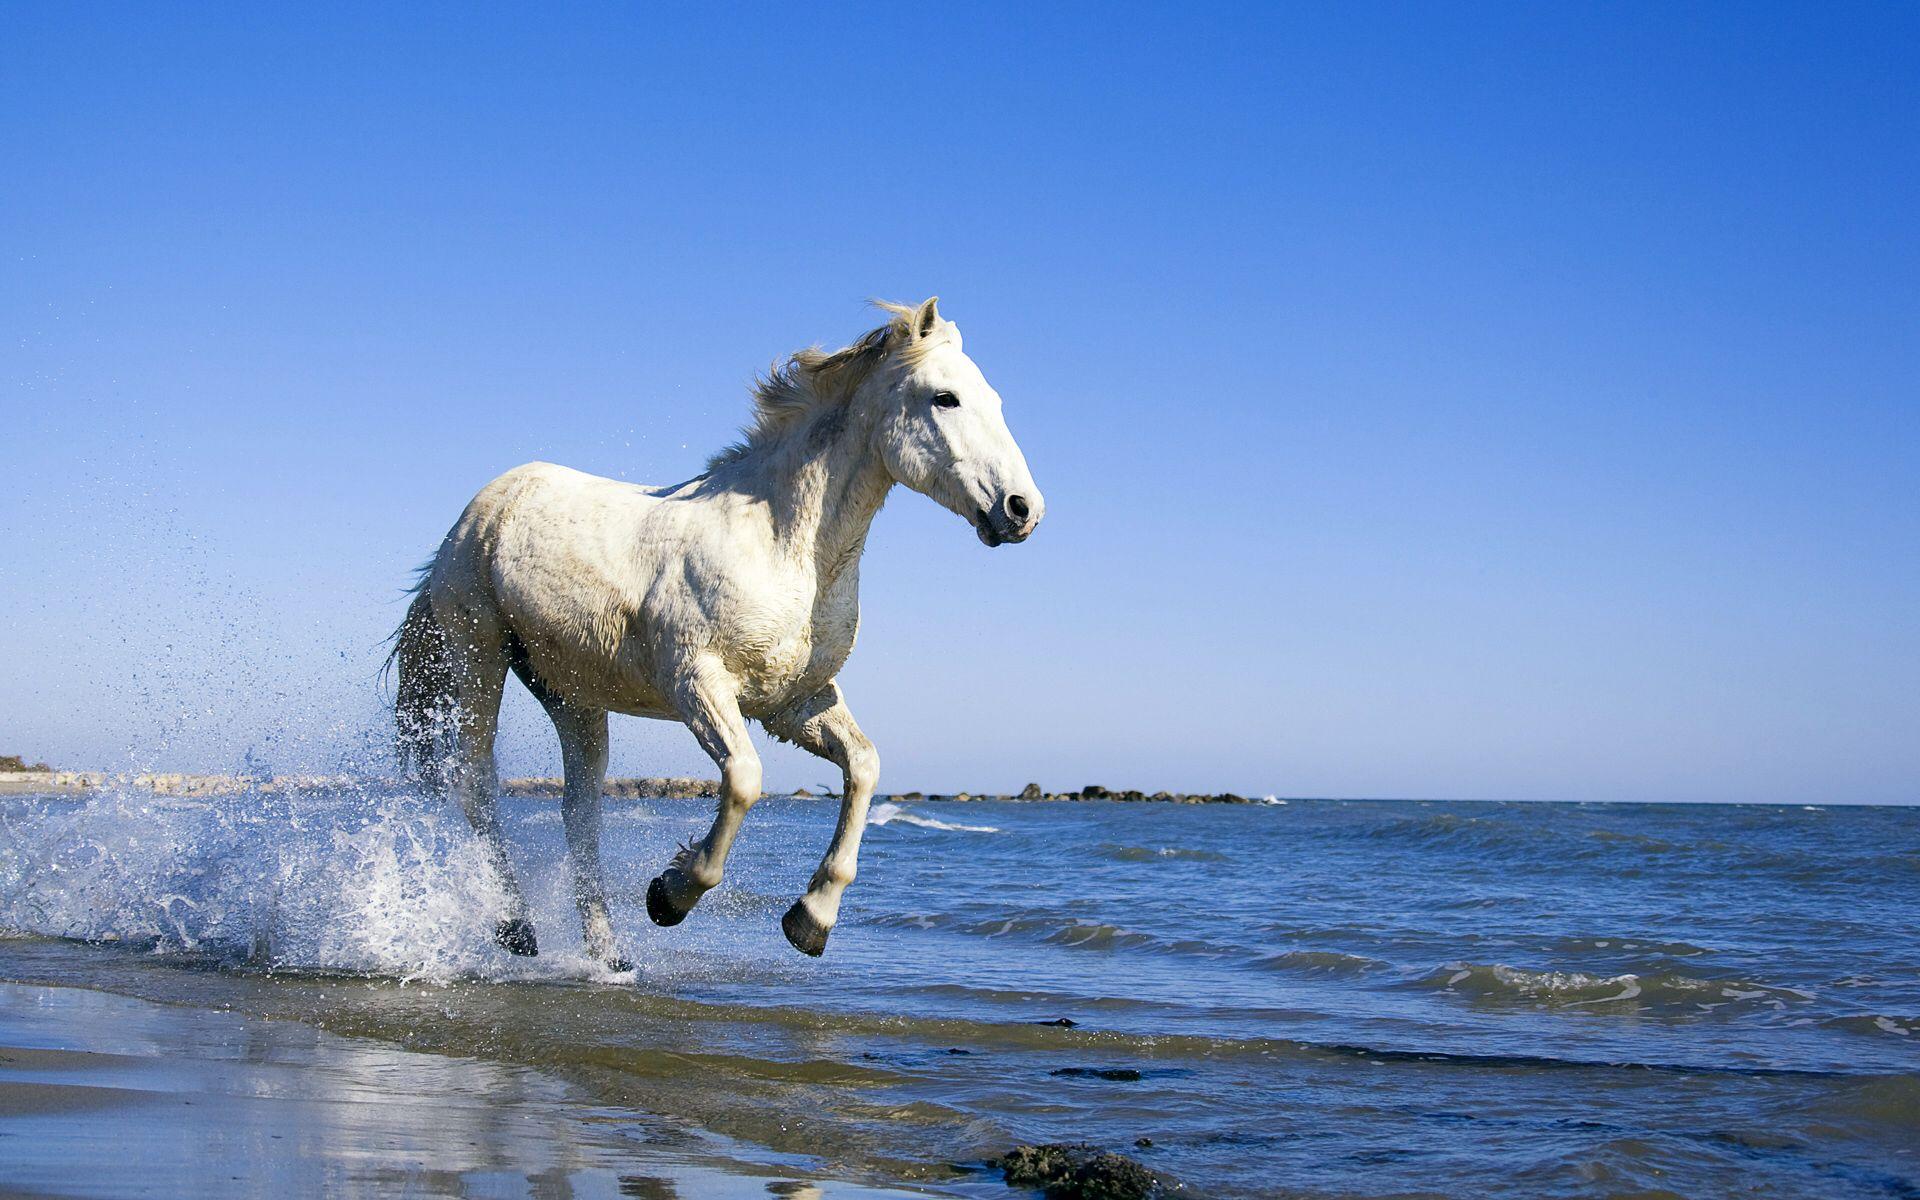 Must see Wallpaper Horse Spirit - 1e6178baa2eeafc90f9bbee6baf0094a  HD_879888.jpg